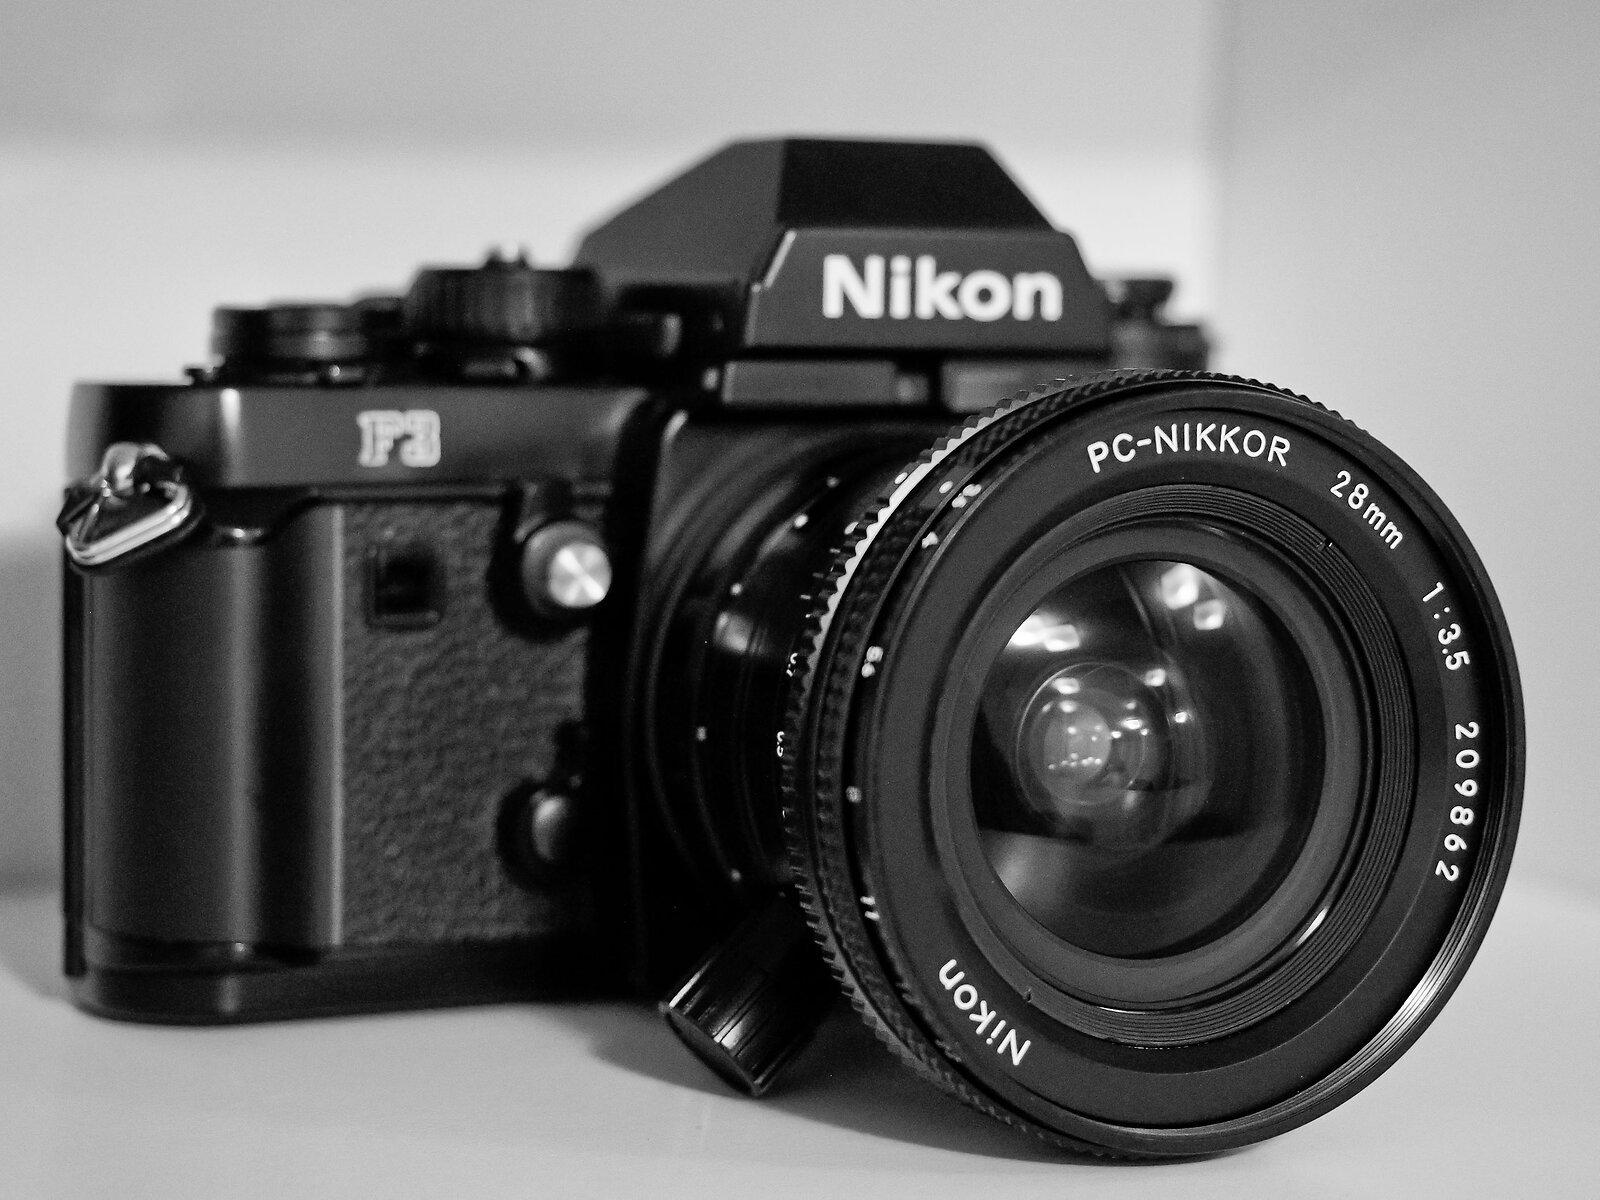 Nikon 28mm 3.5 PC09.jpg